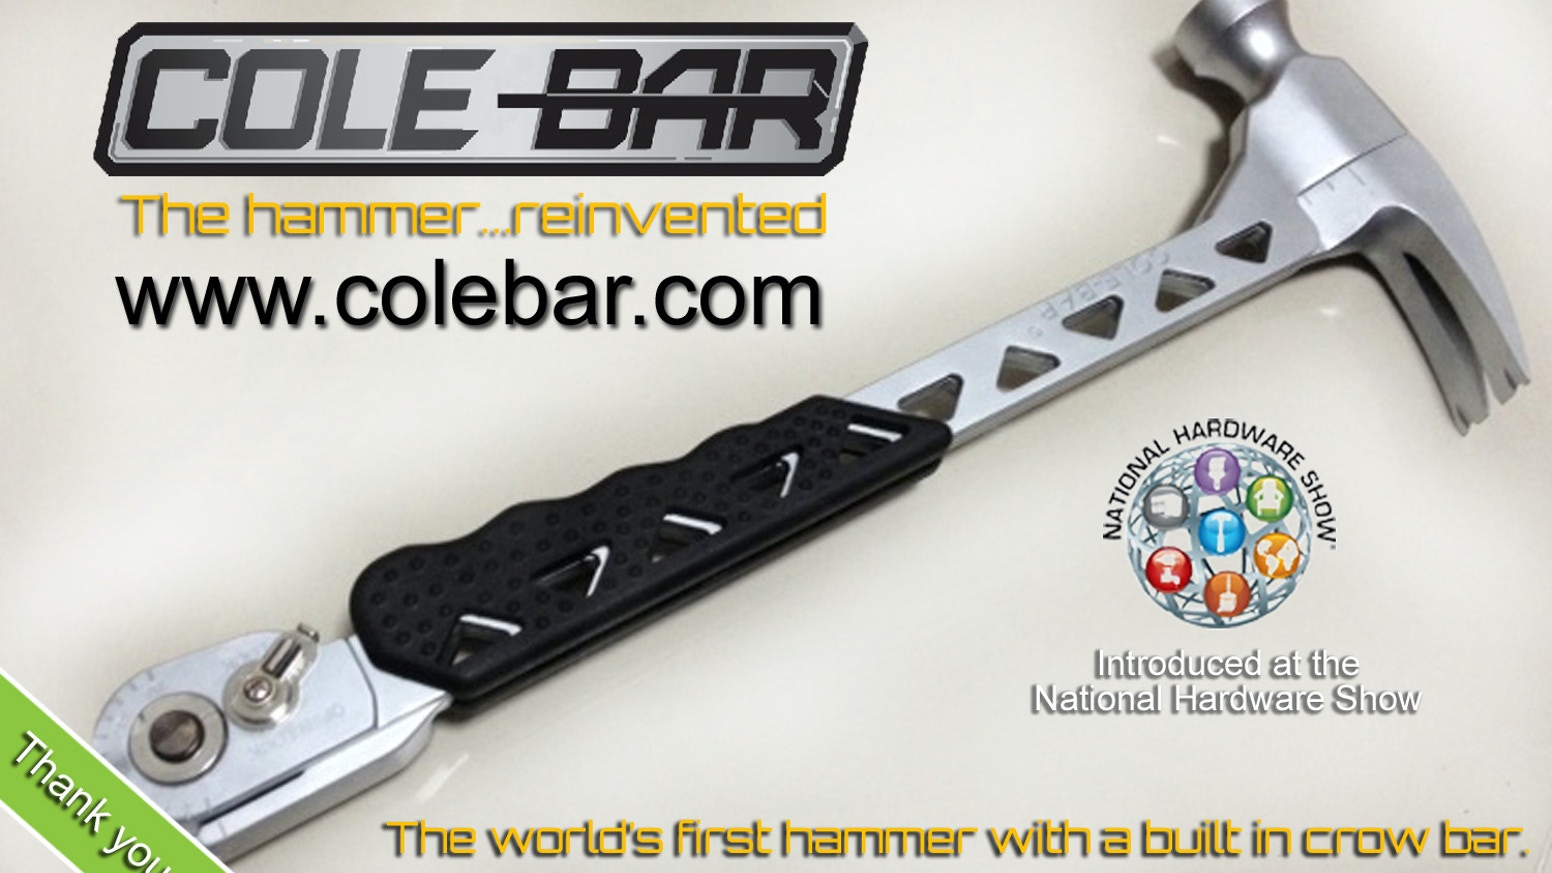 The Cole-Bar Hammer by Lance, Brandon, Heather Hyde — Kickstarter